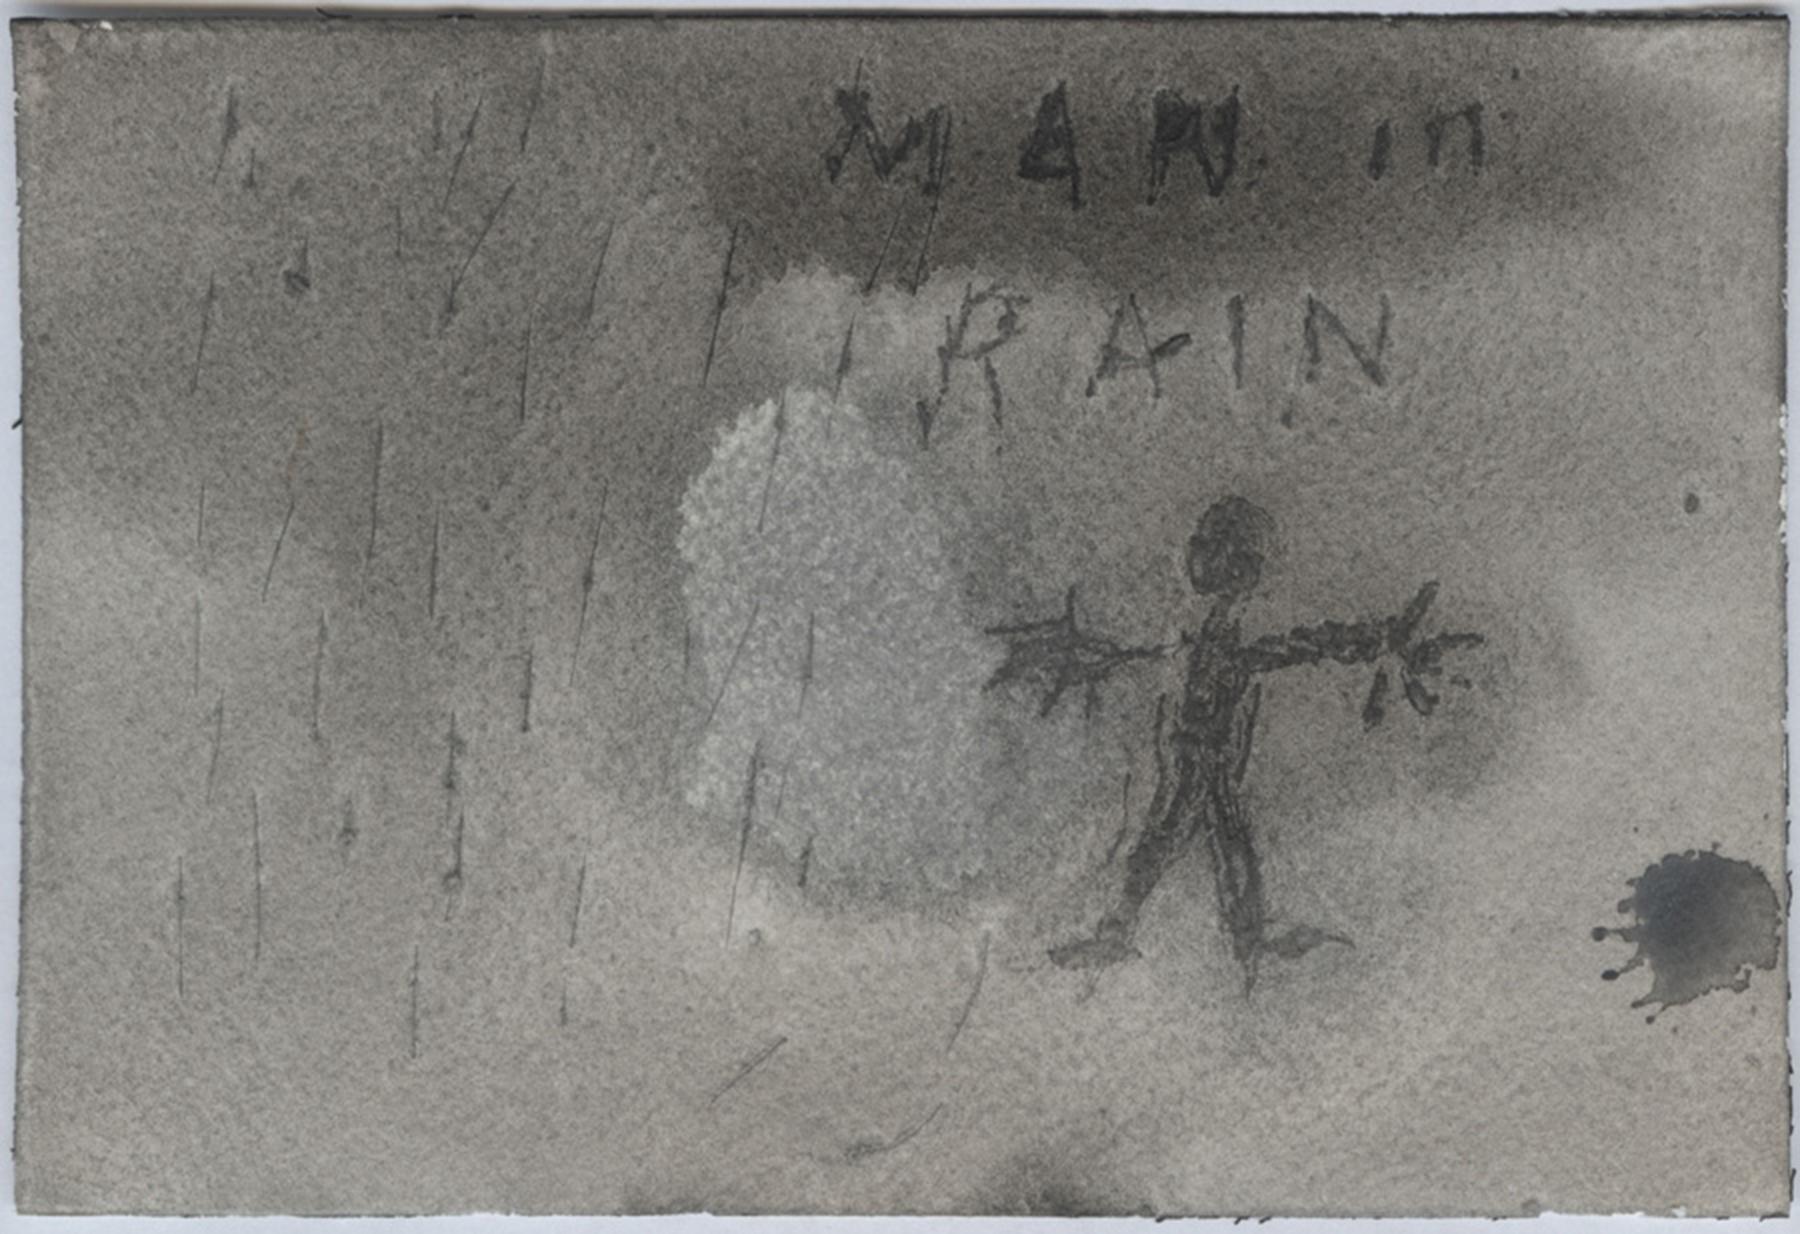 MAN IN THE RAIN-wc